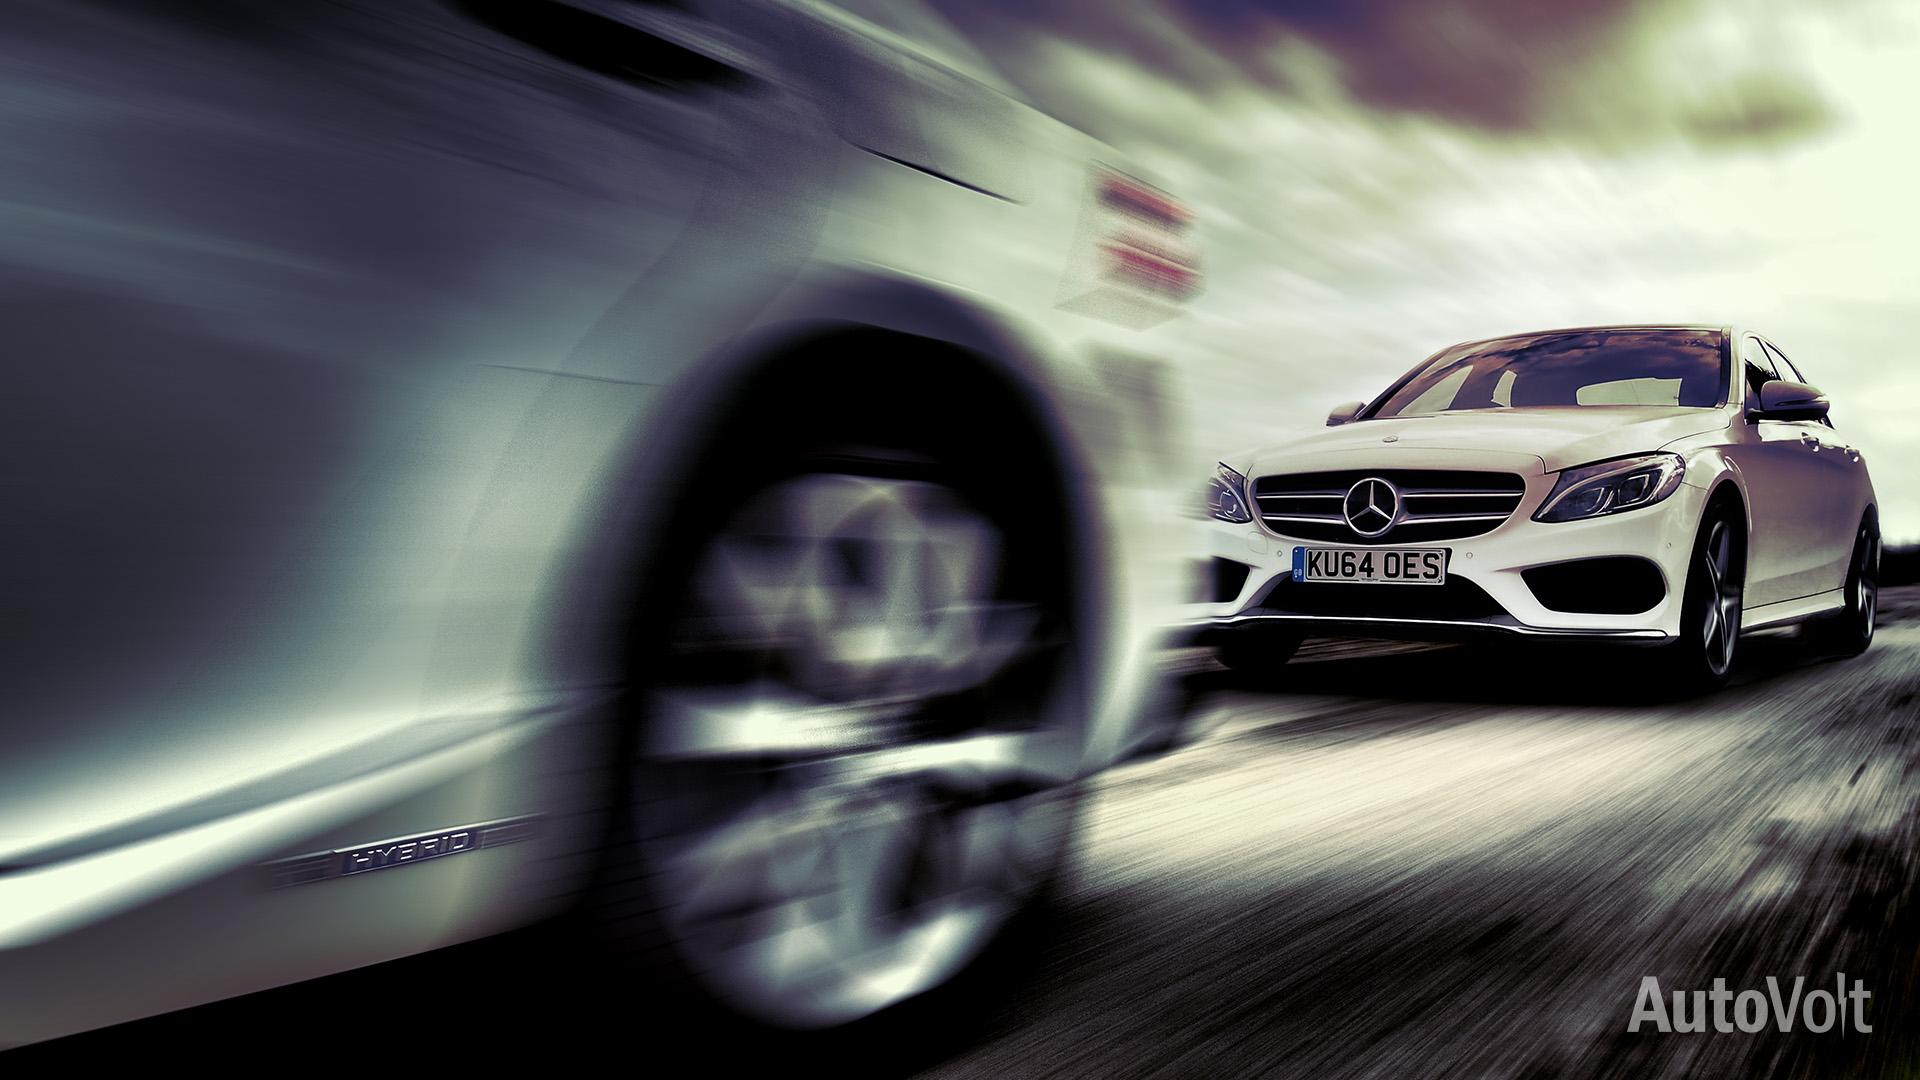 Mercedes C300 BlueTEC Hybrid AMG Line Photo